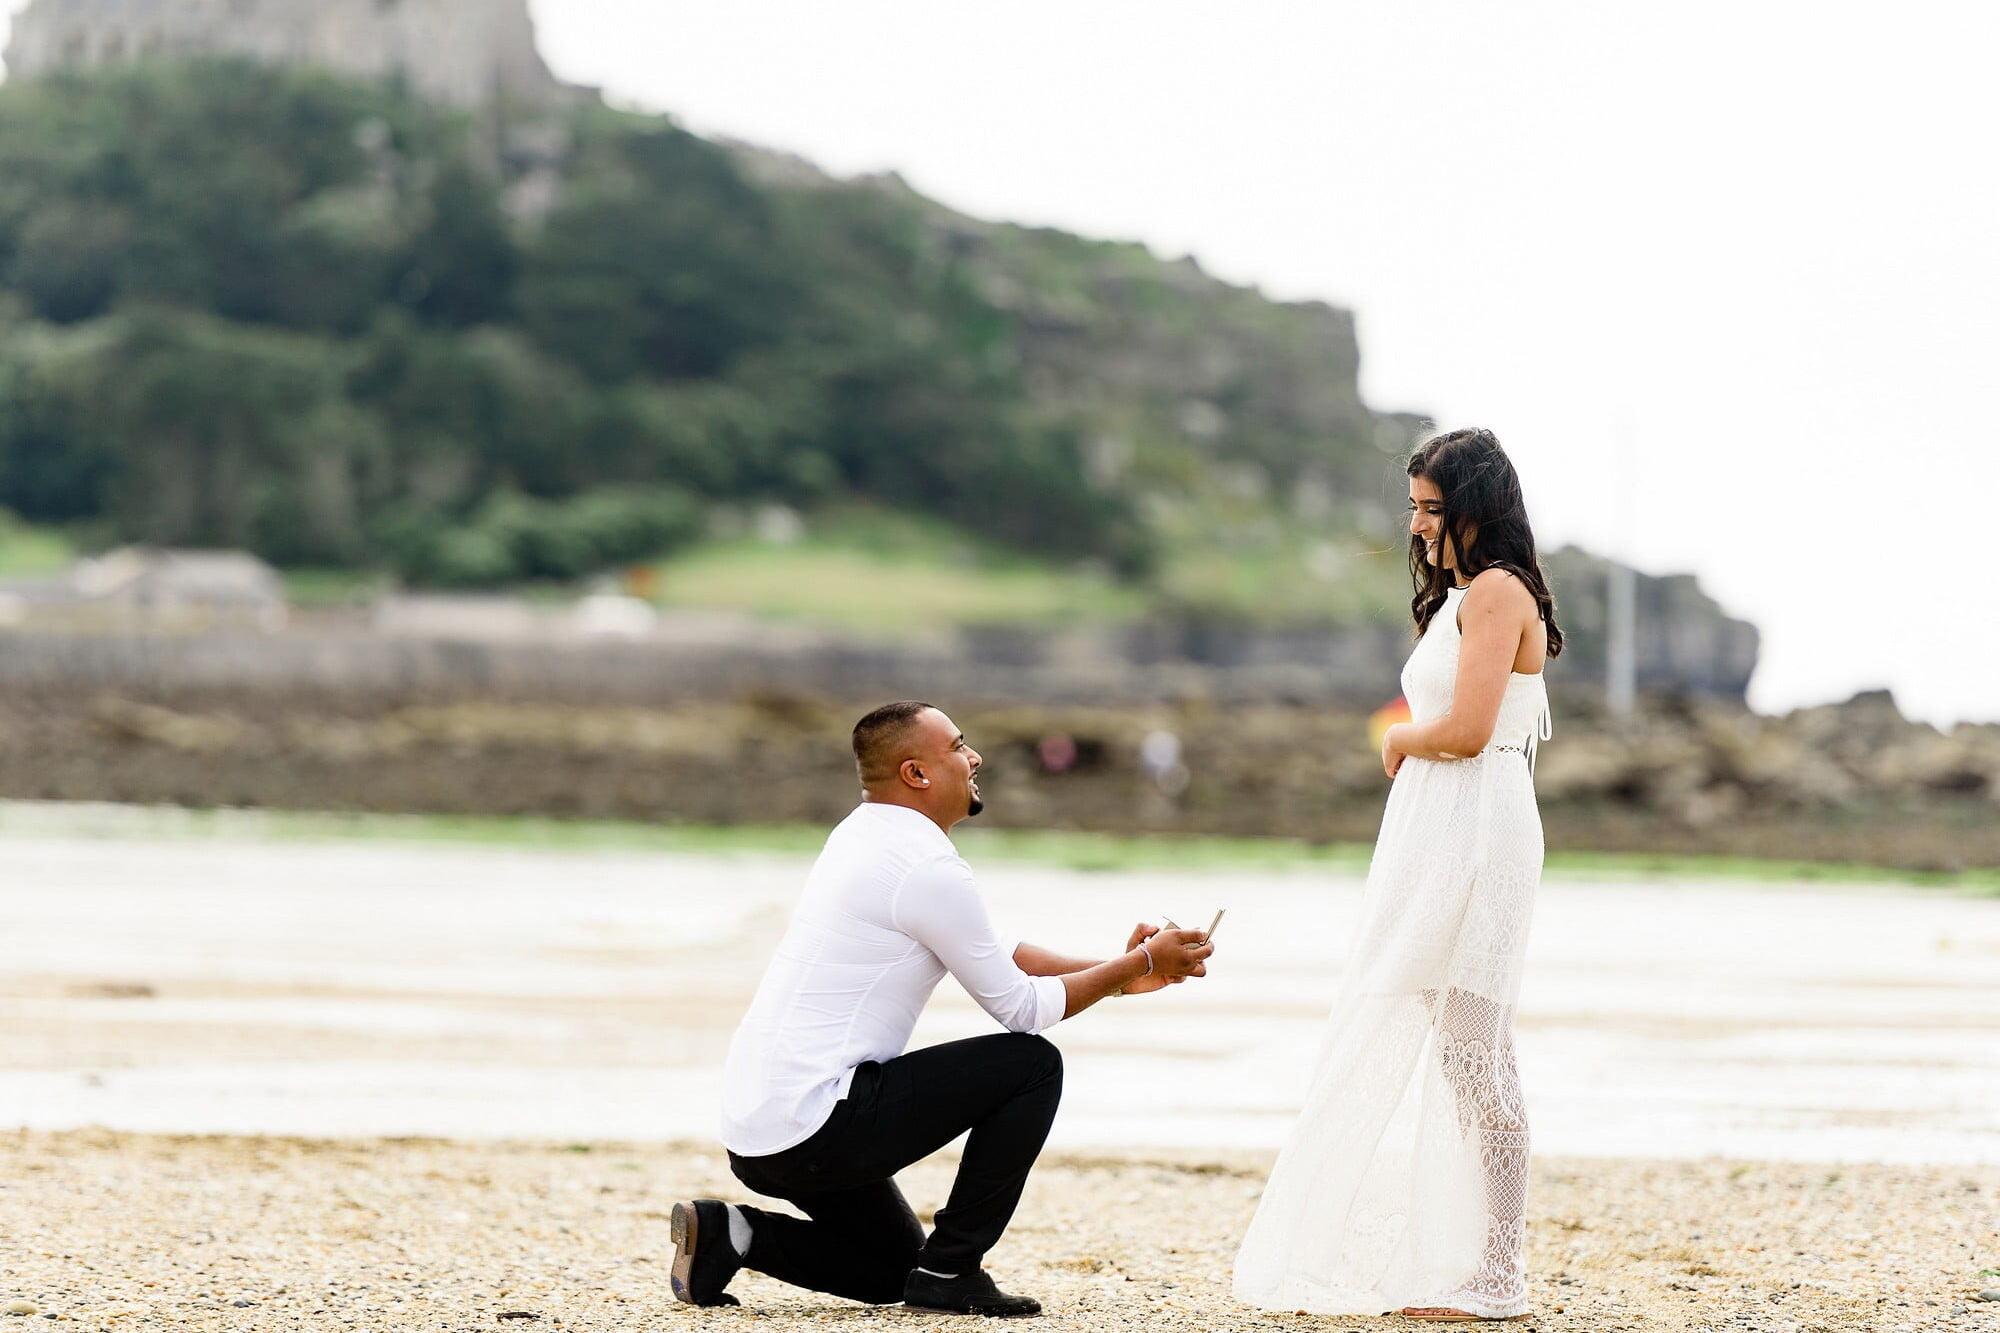 st-michaels-mount-wedding-proposal-11